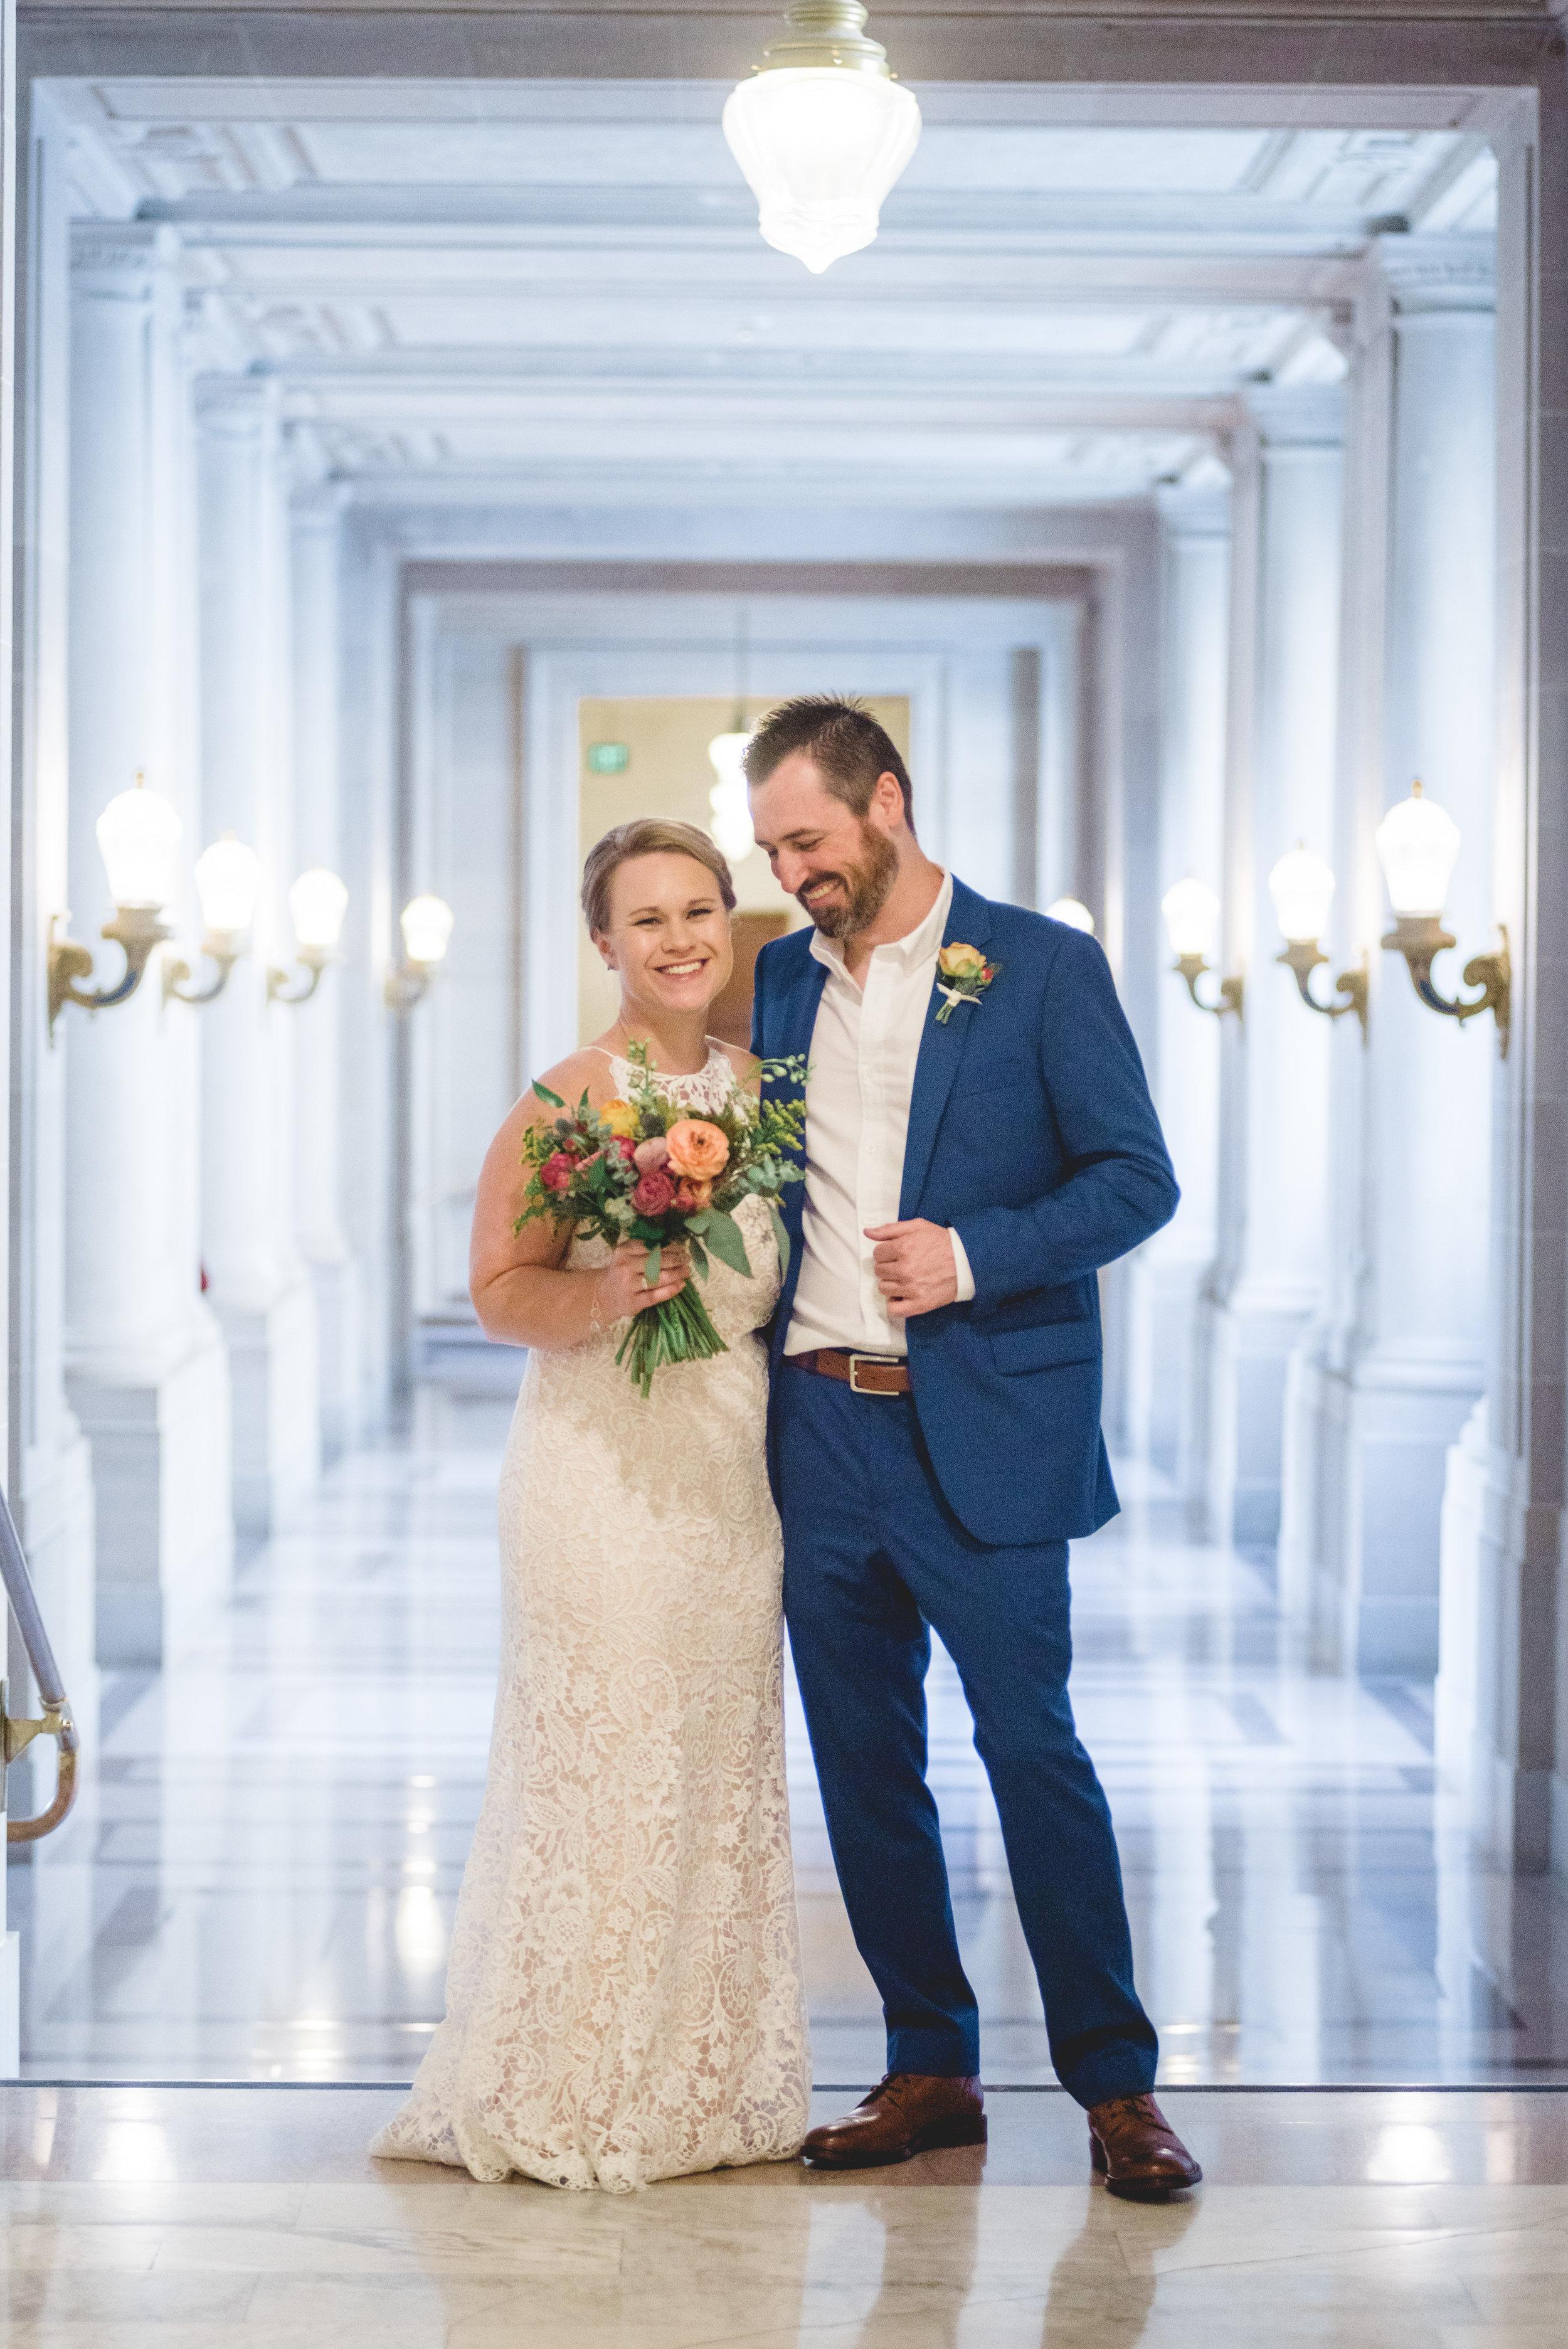 mcdaniels_conroy-wedding-couple-32.jpg